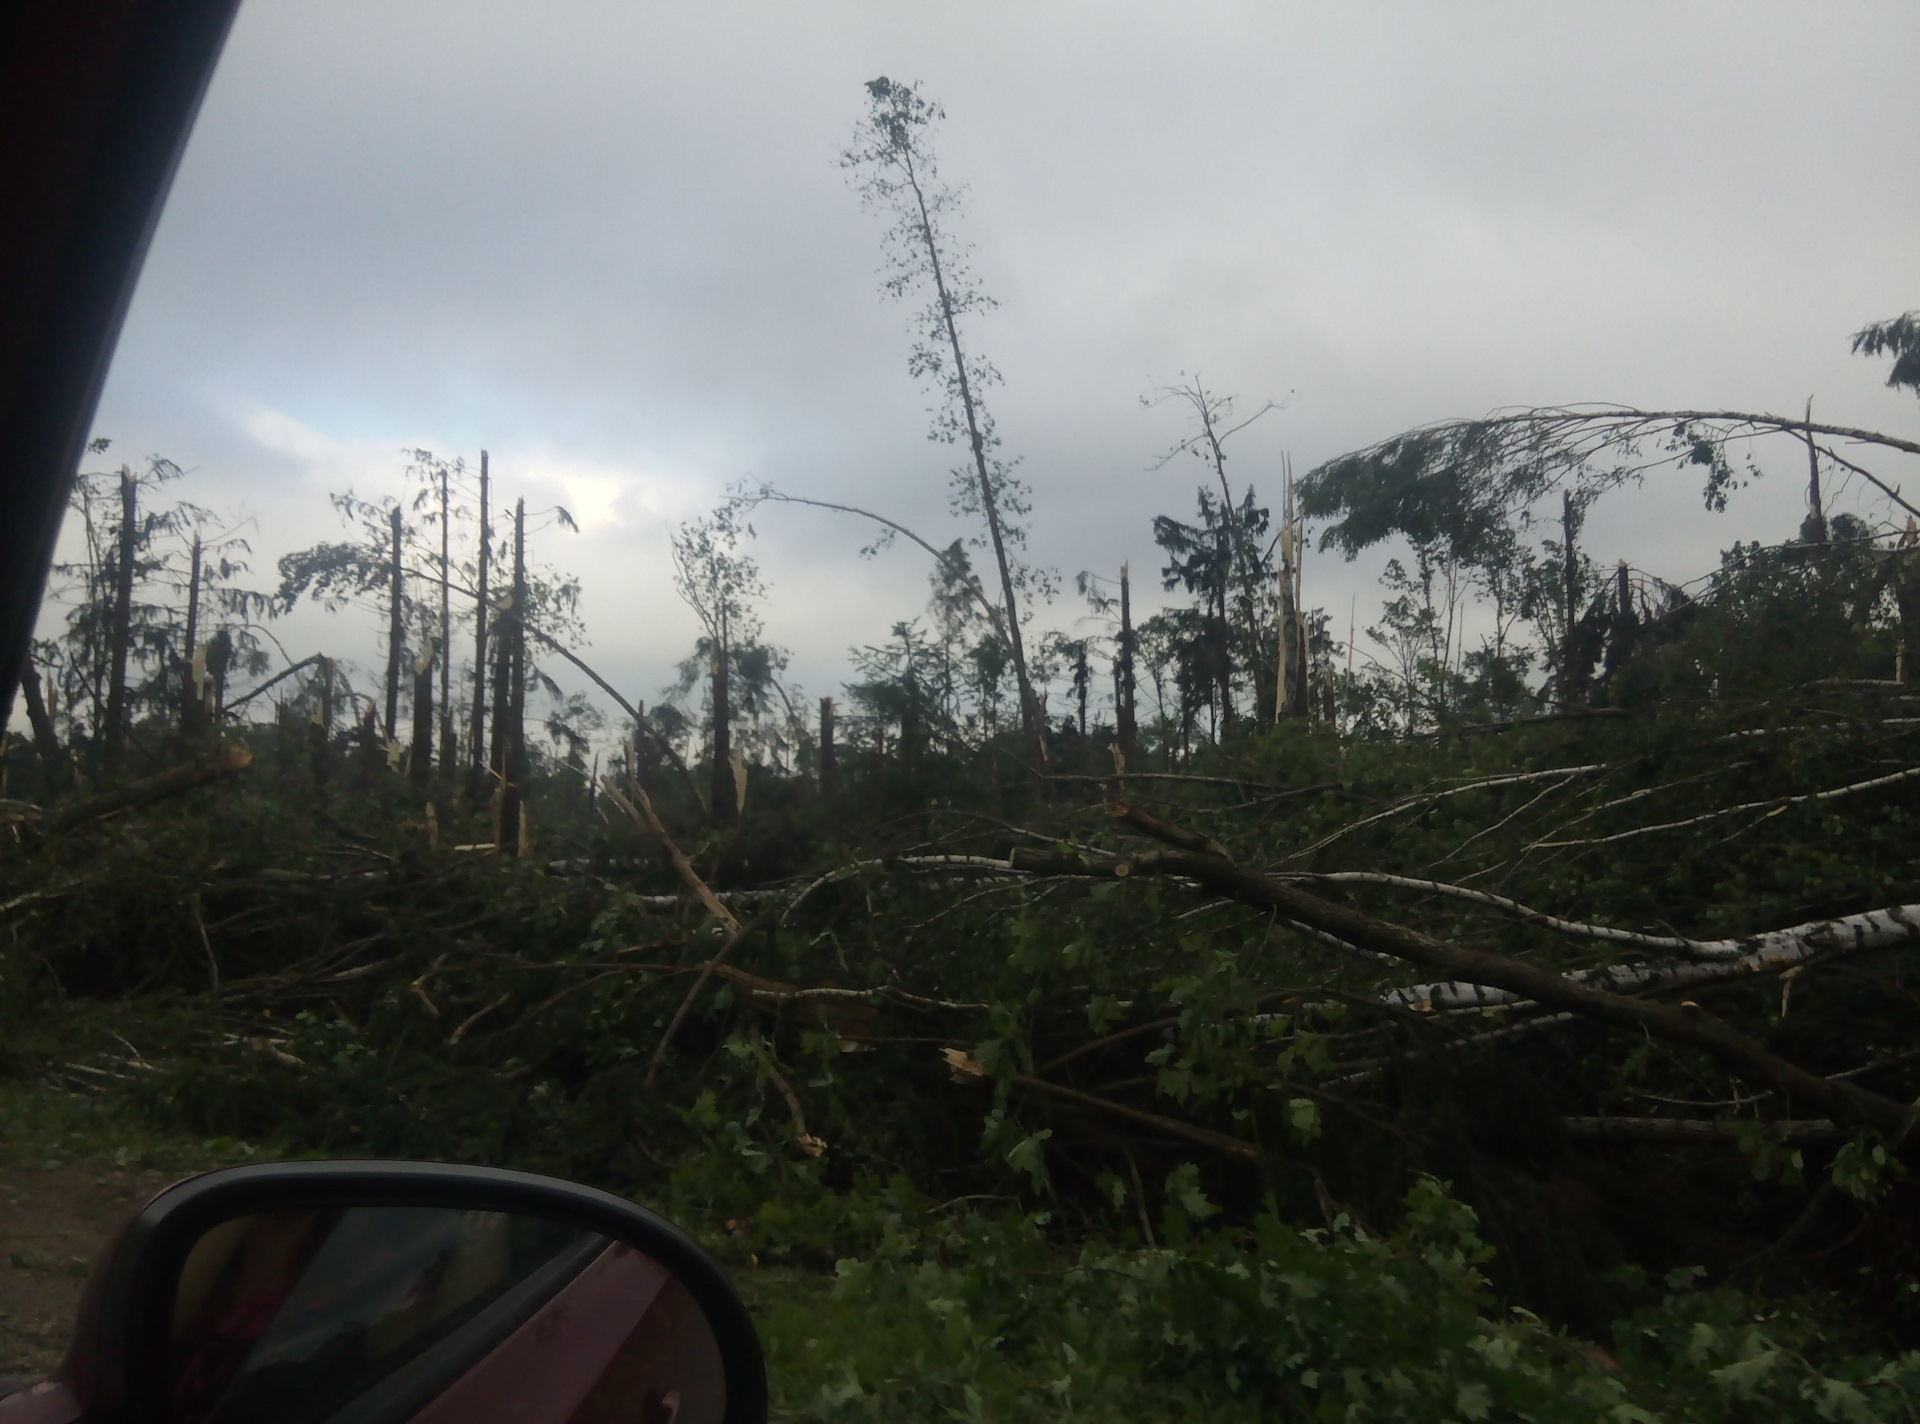 фотоаппарата, как ураган беларусь картинки некоторые можно